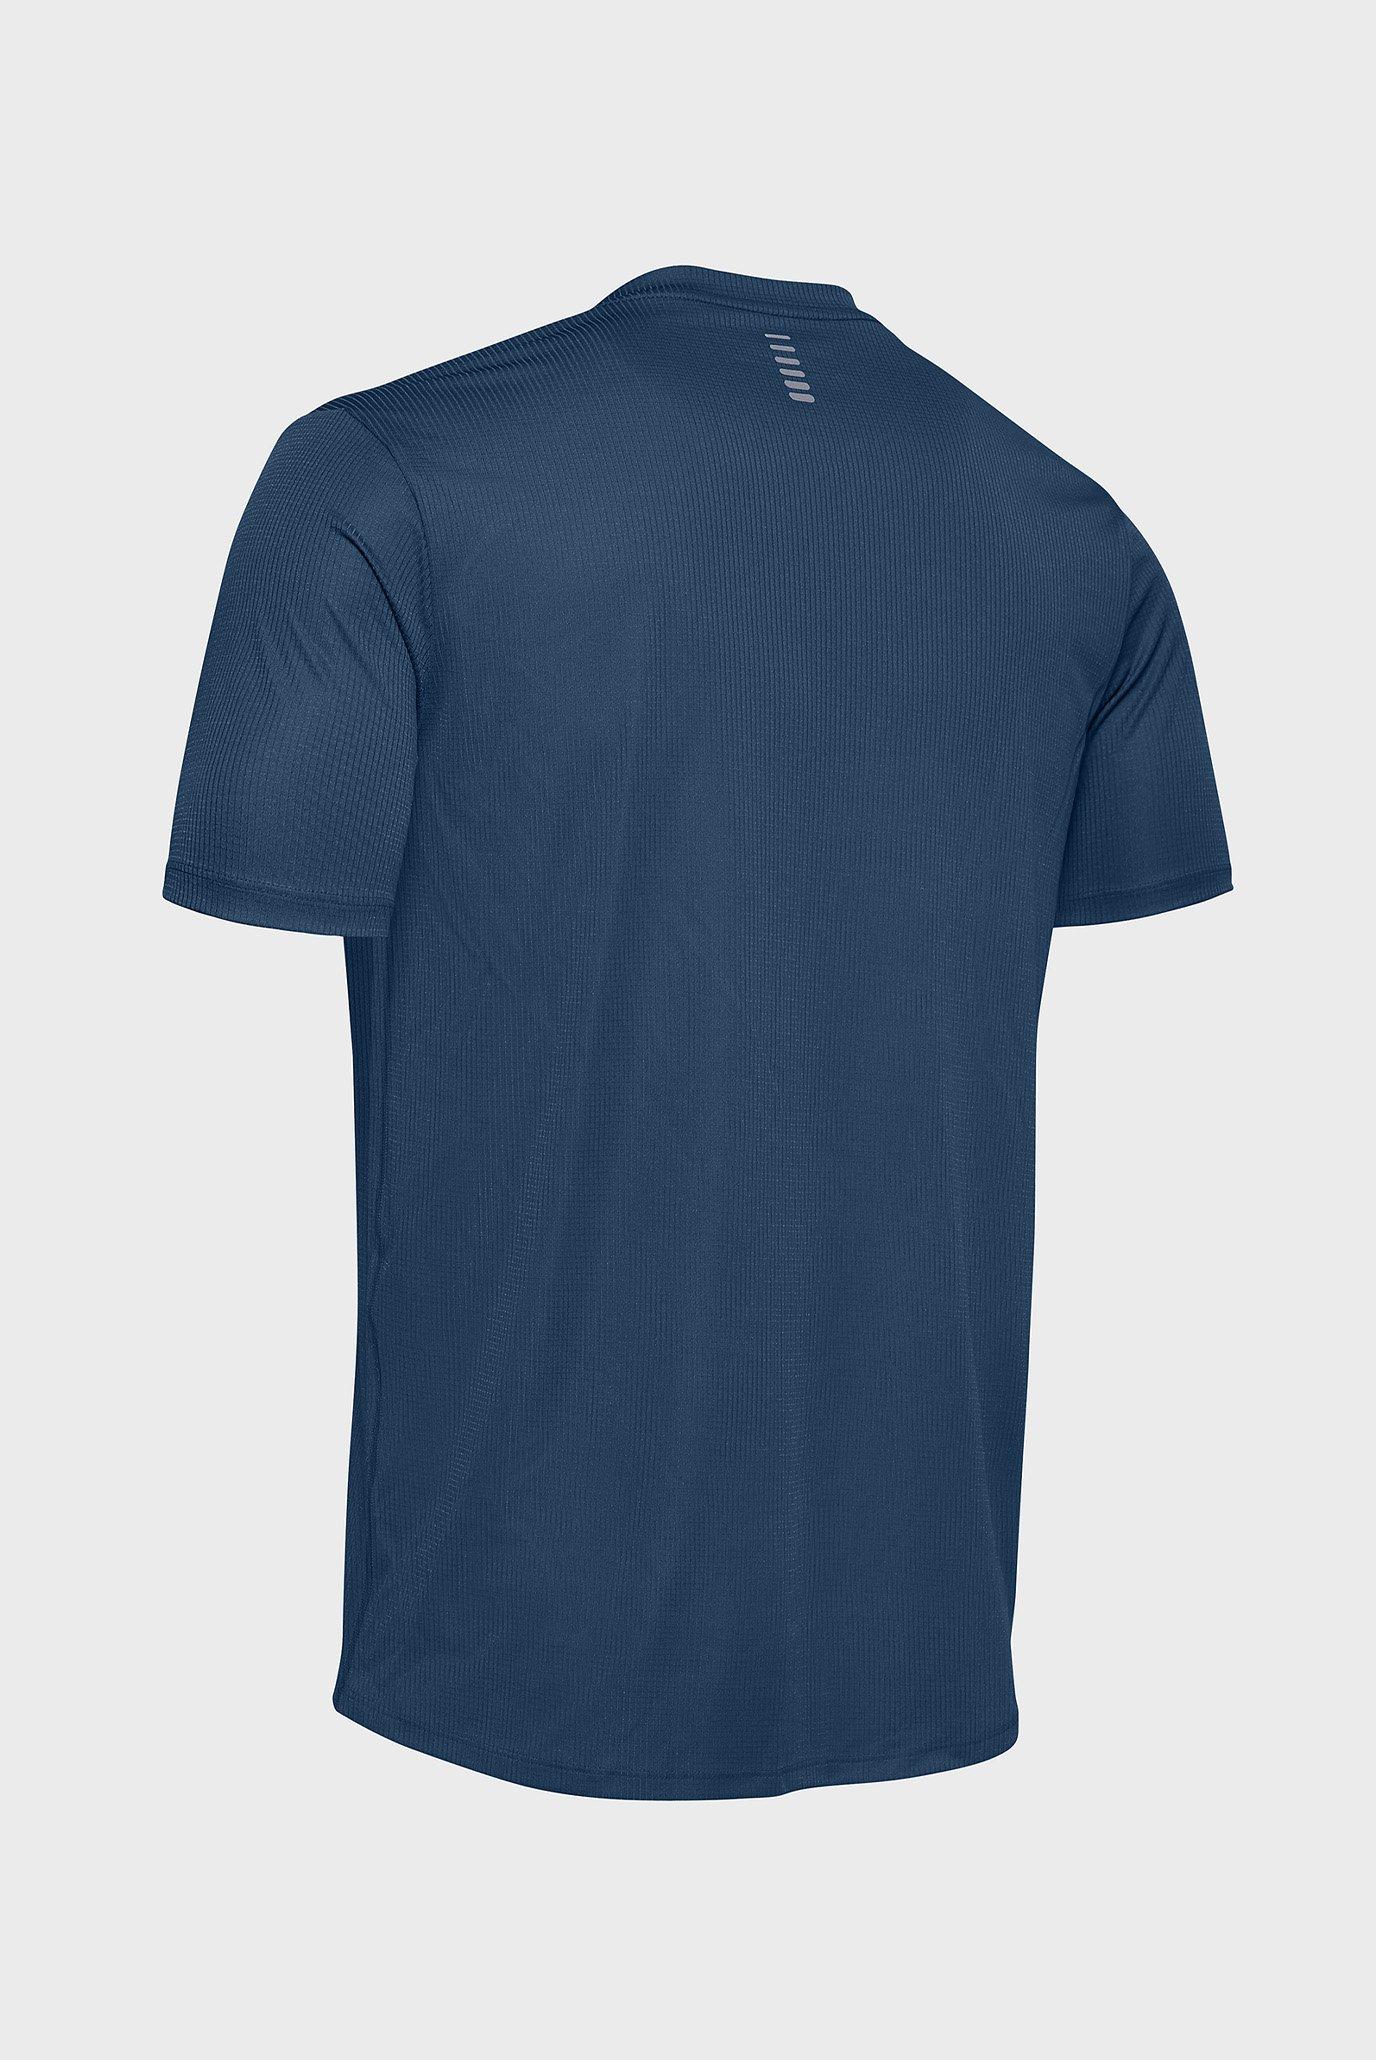 Мужская темно-синяя футболка UA RUN FORM GRAPHIC TEE Under Armour